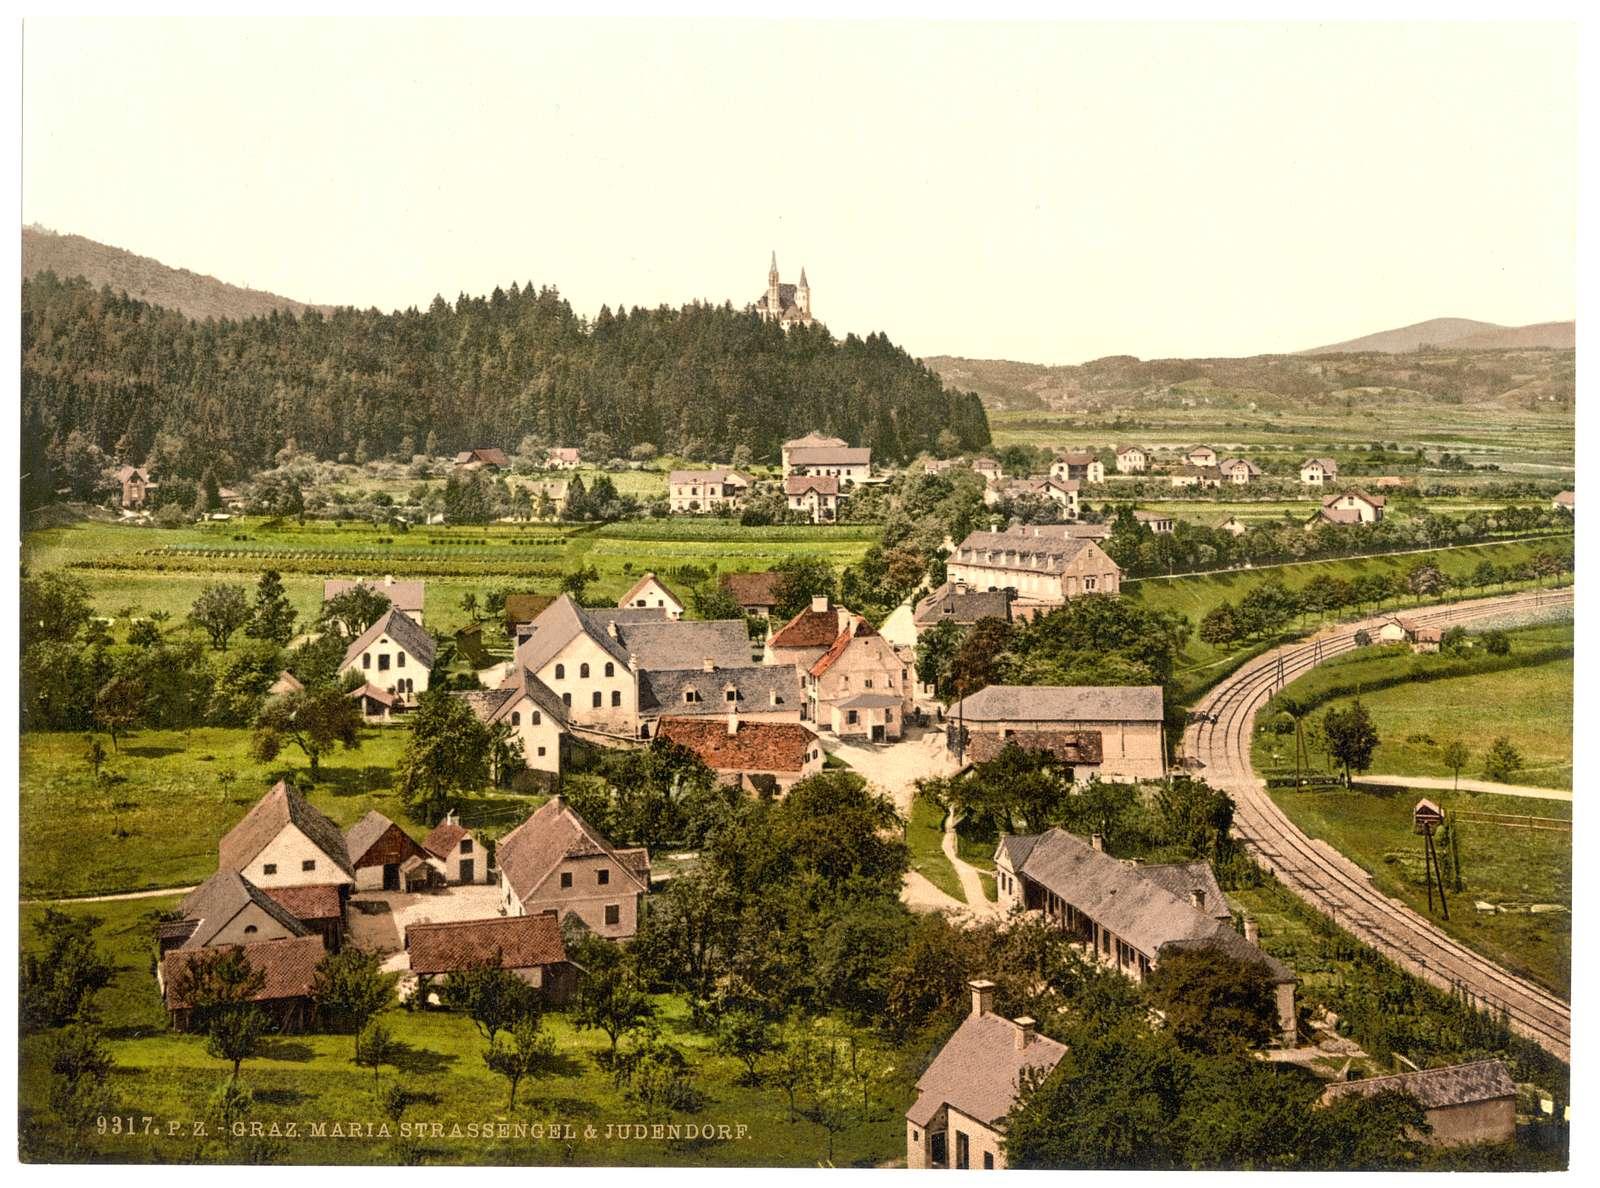 [Graz, Maria Strassengal (i.e., Maria-Strassongel) and Judendorf, Styria, Austro-Hungary]